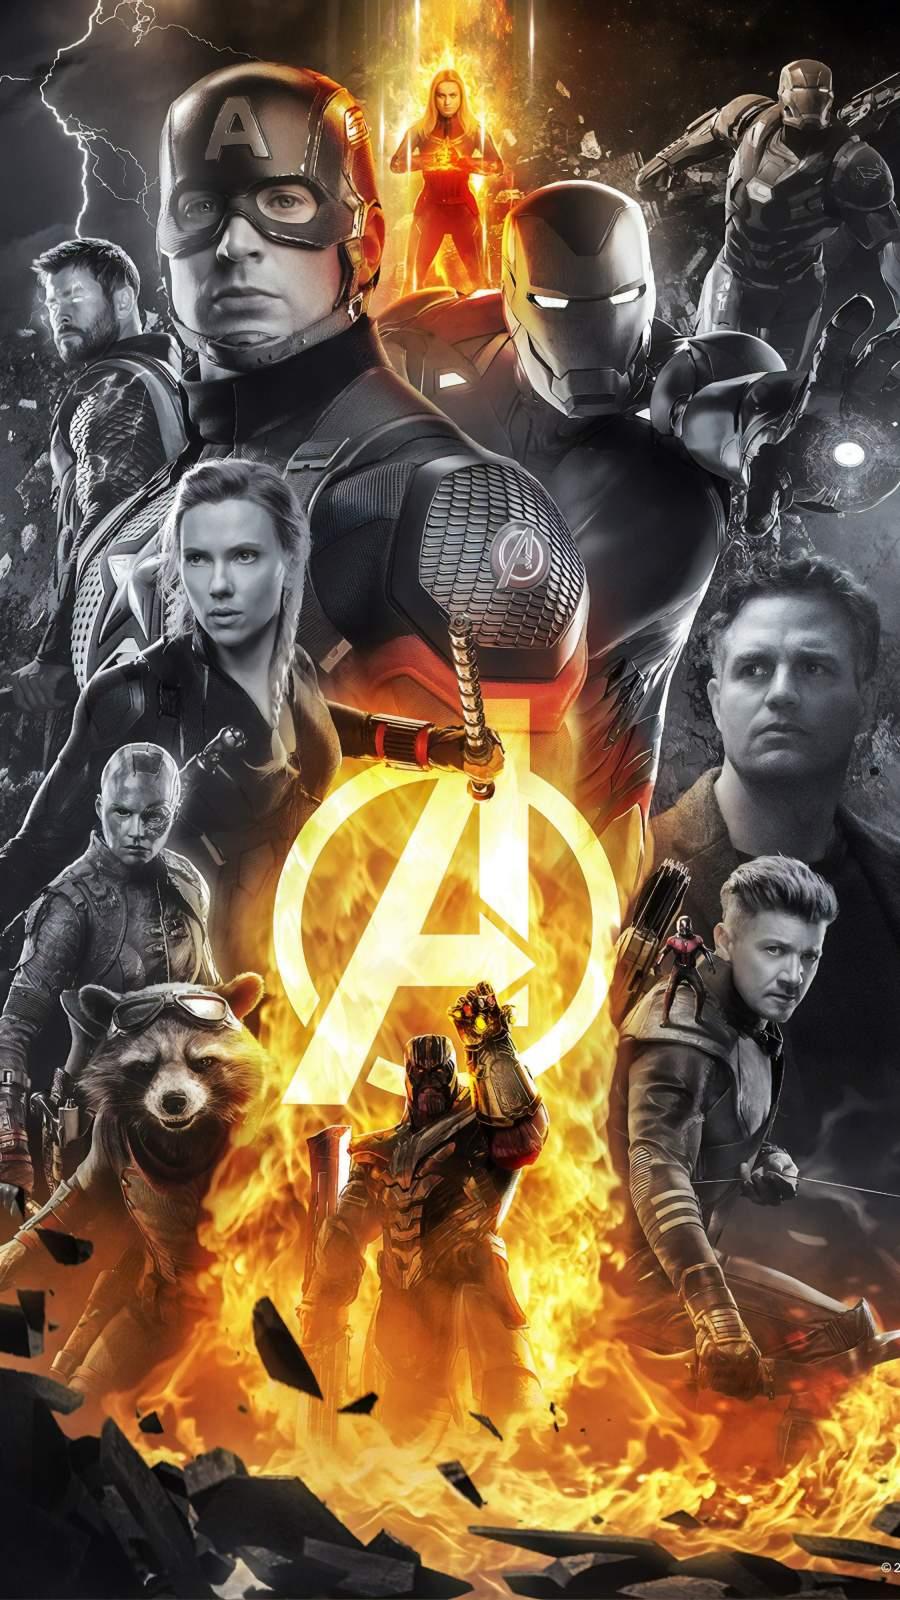 Avengers All Superheroes iPhone Wallpaper